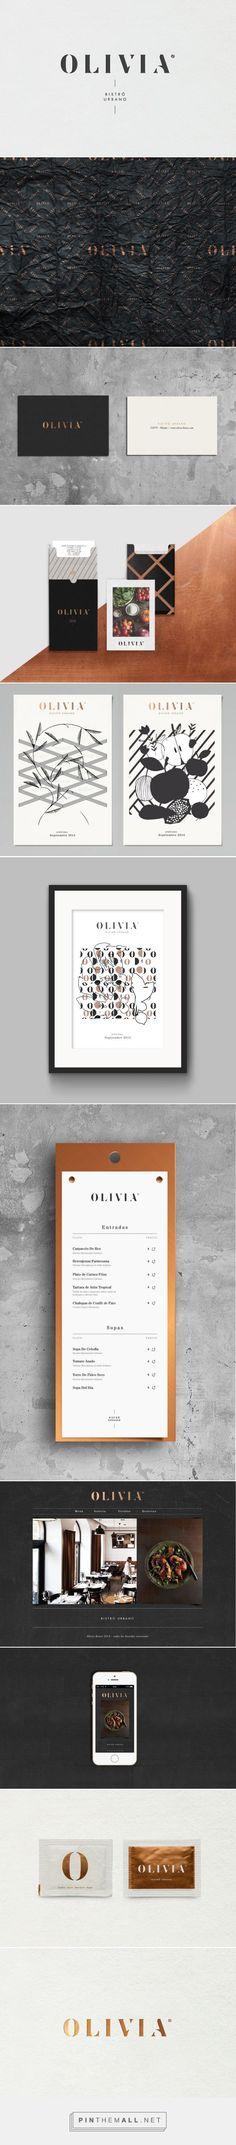 Olivia Bistro Urbano Branding on Behance | Fivestar Branding – Design and Branding Agency & Inspiration Gallery